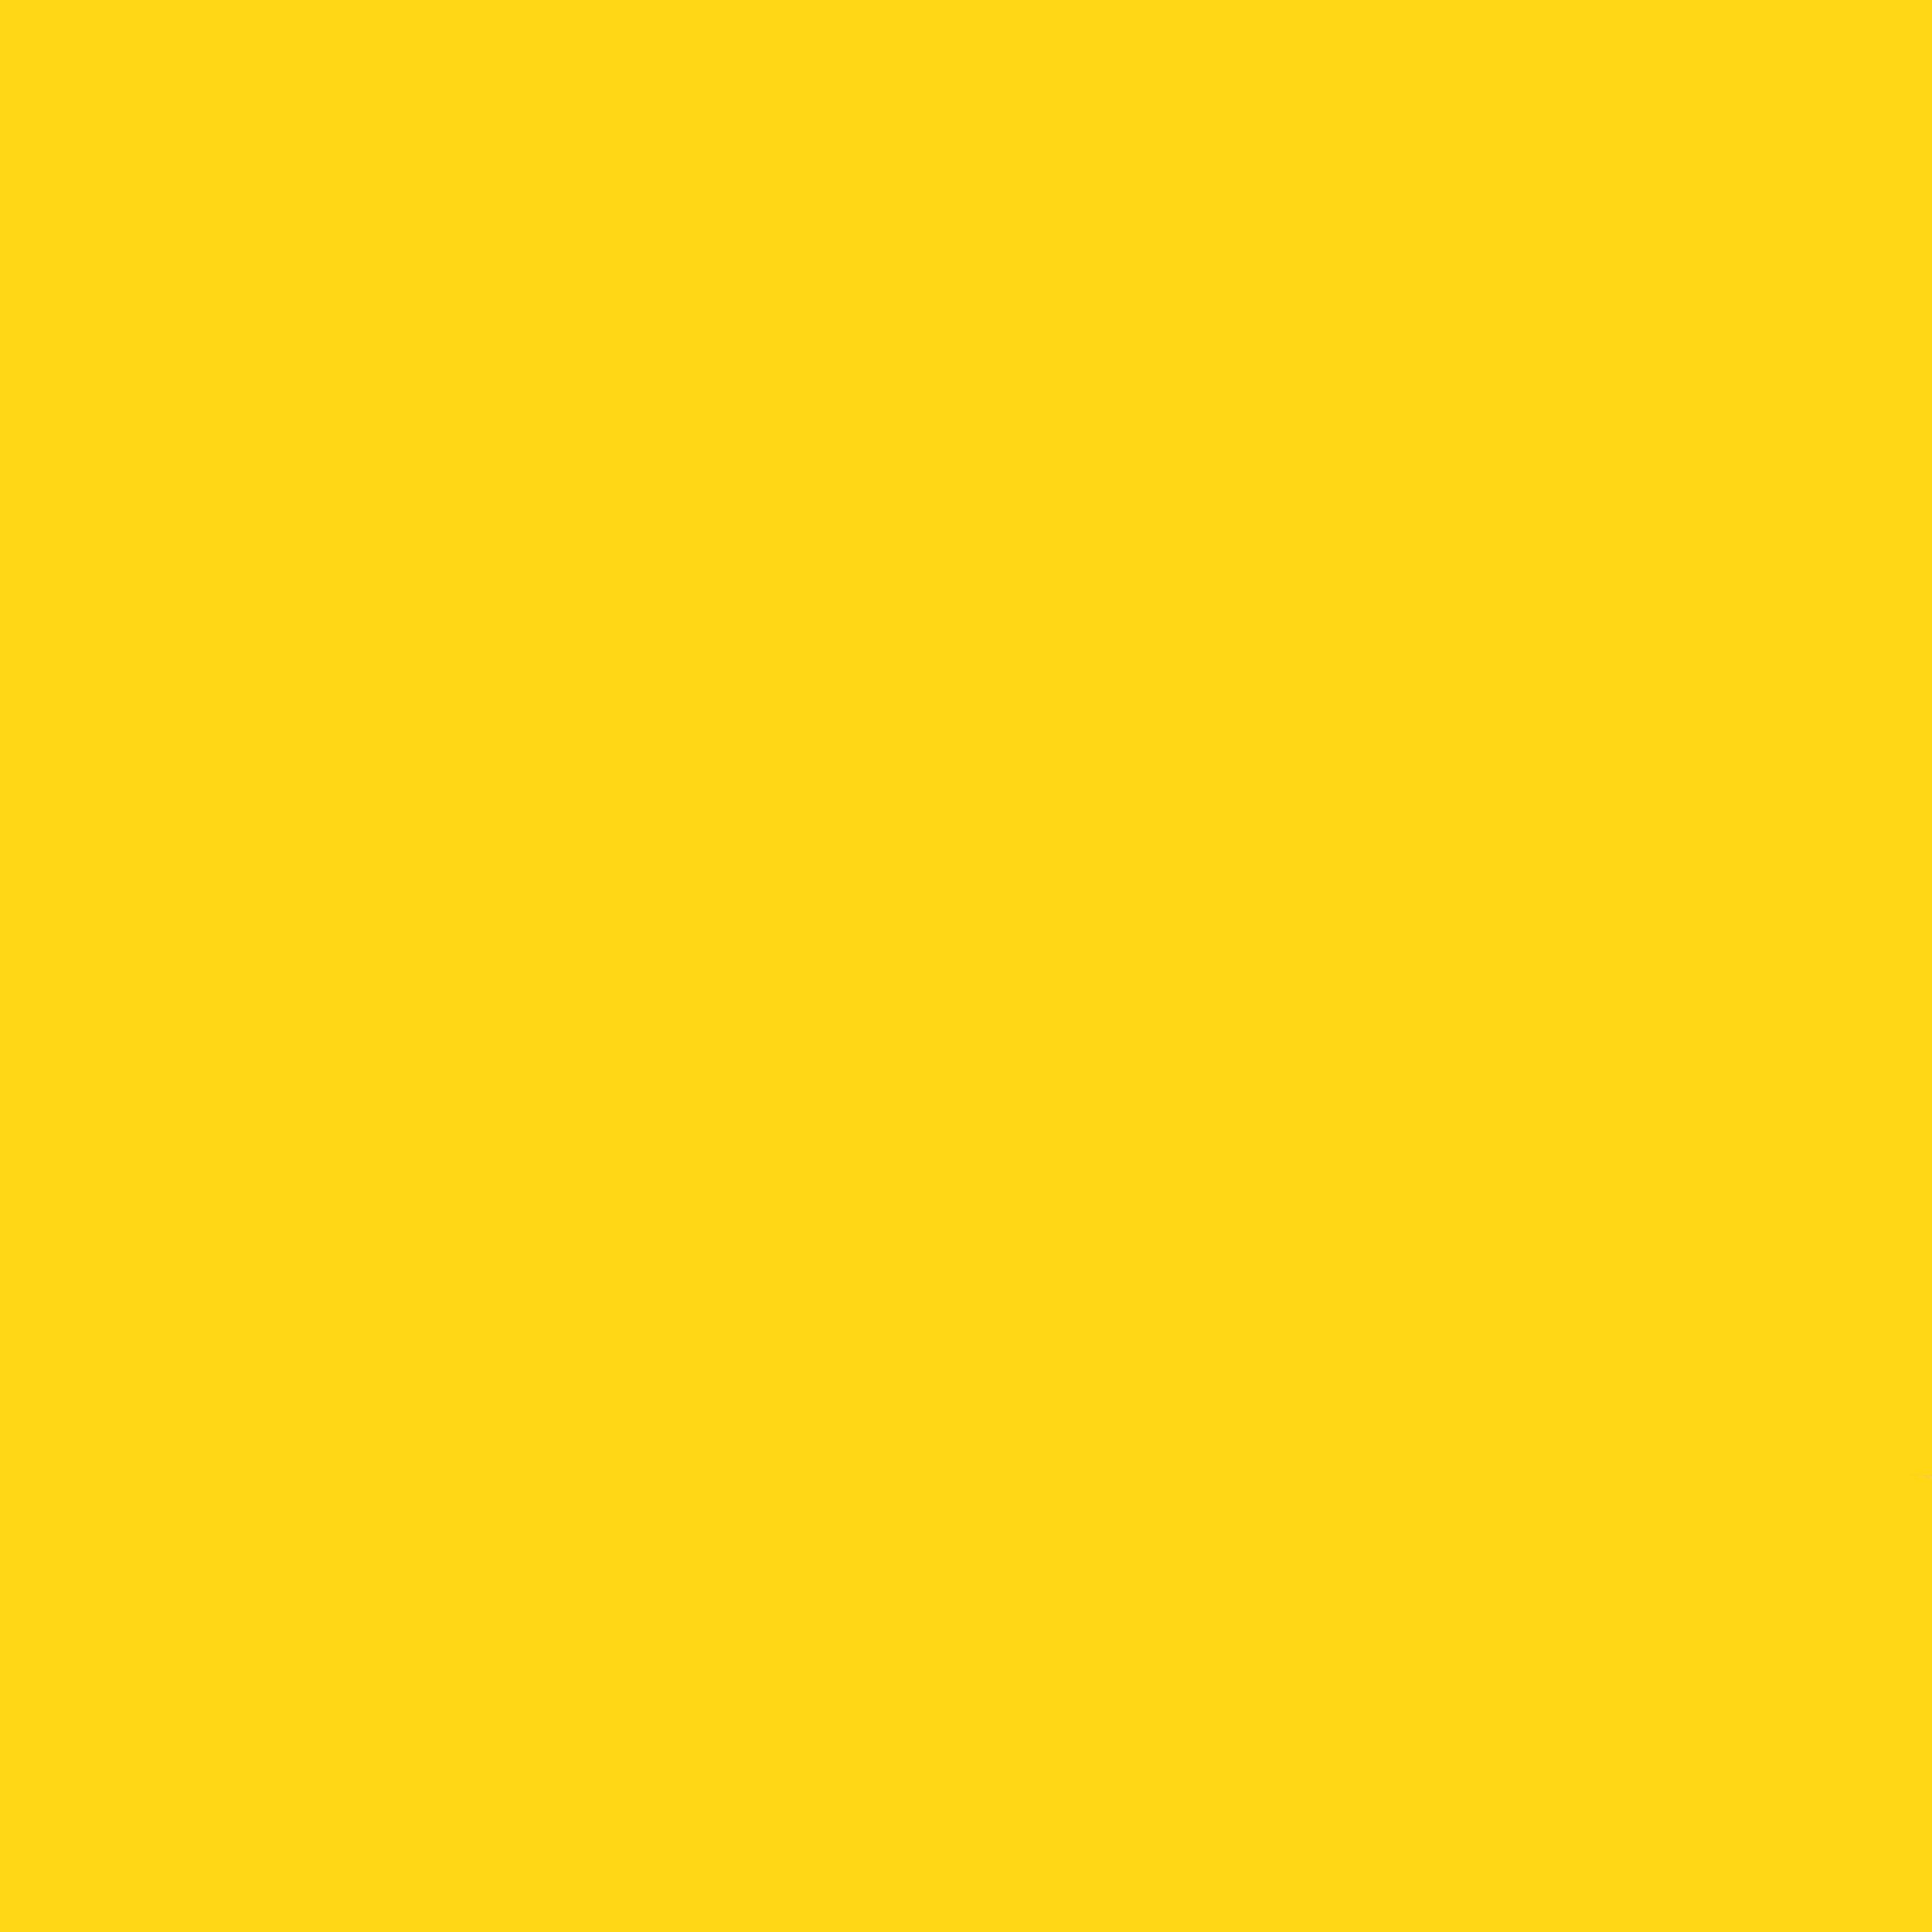 Ткань желтая - студия SOVA